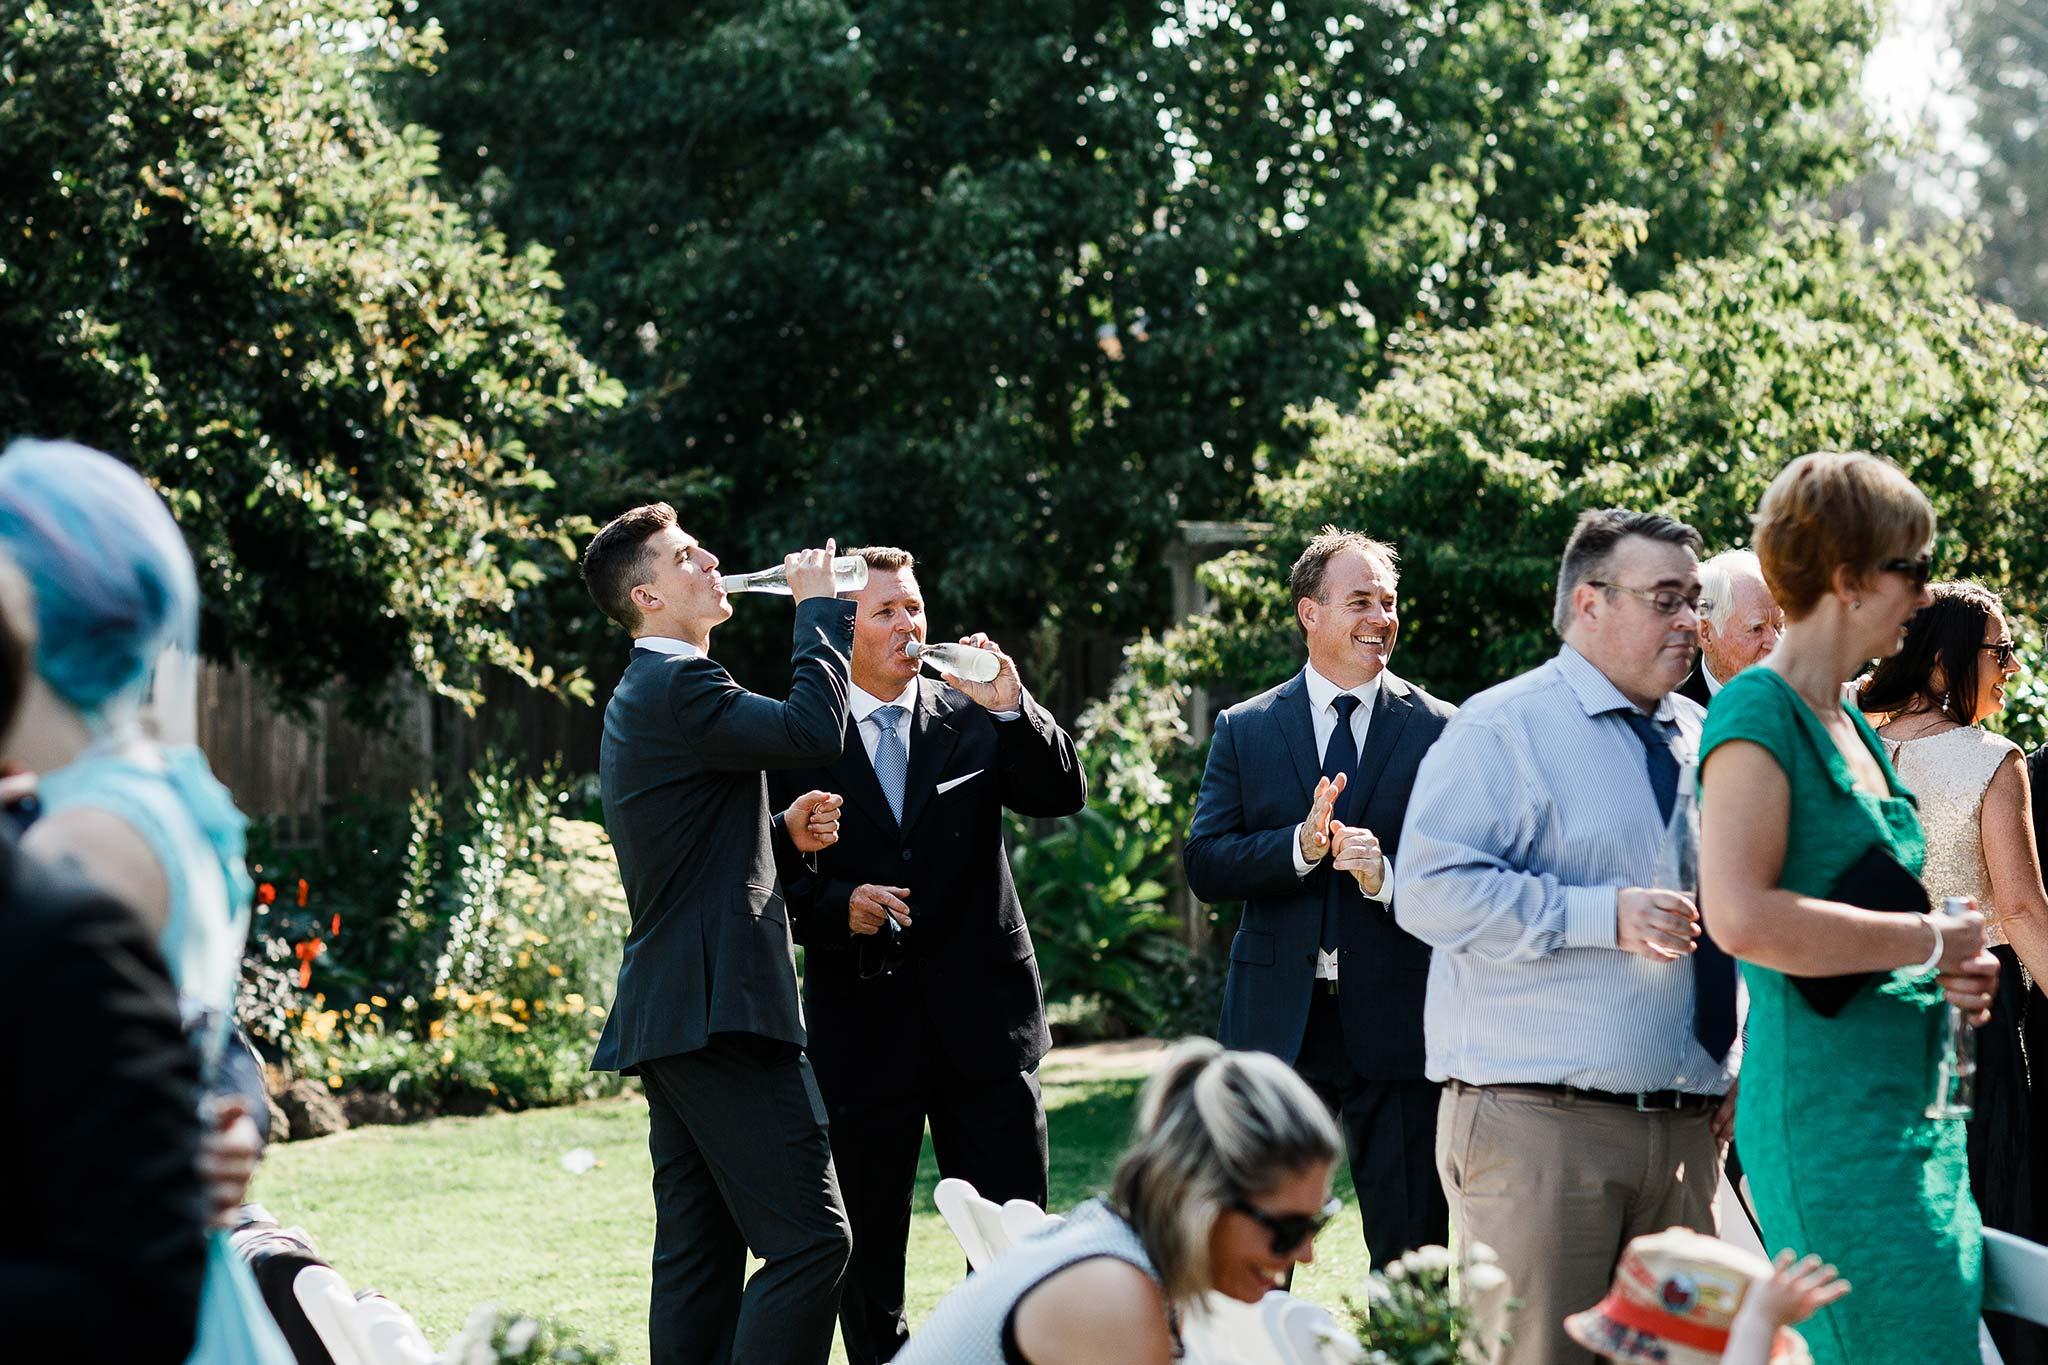 Launceston-Brickendon-Wedding-Photographer-guests